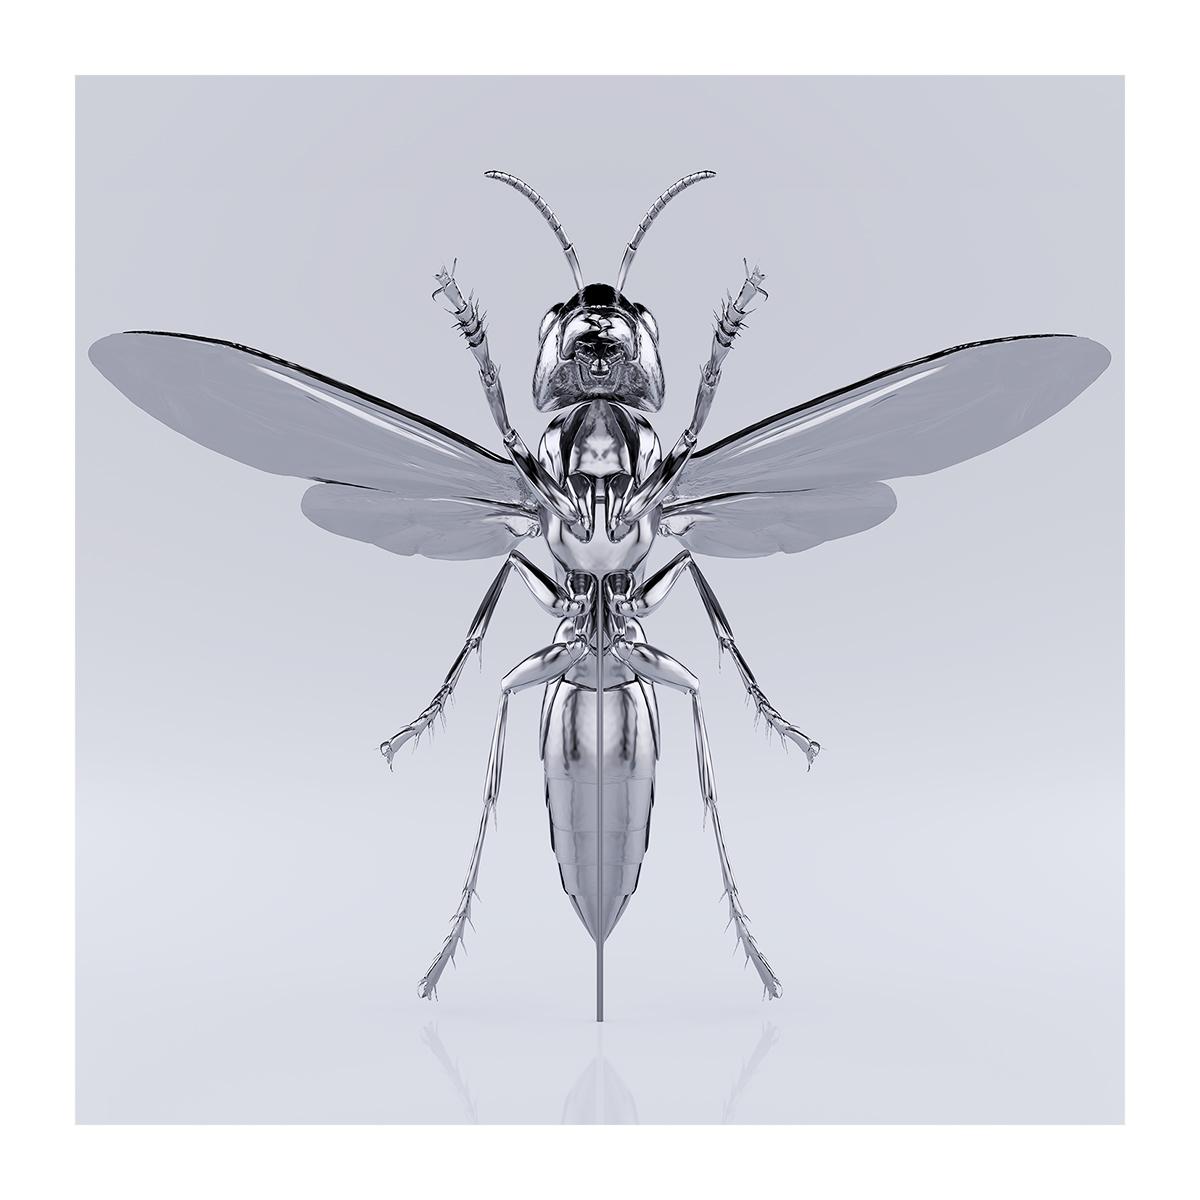 These were the Insects 009 1 - 2020 - These were the Insects